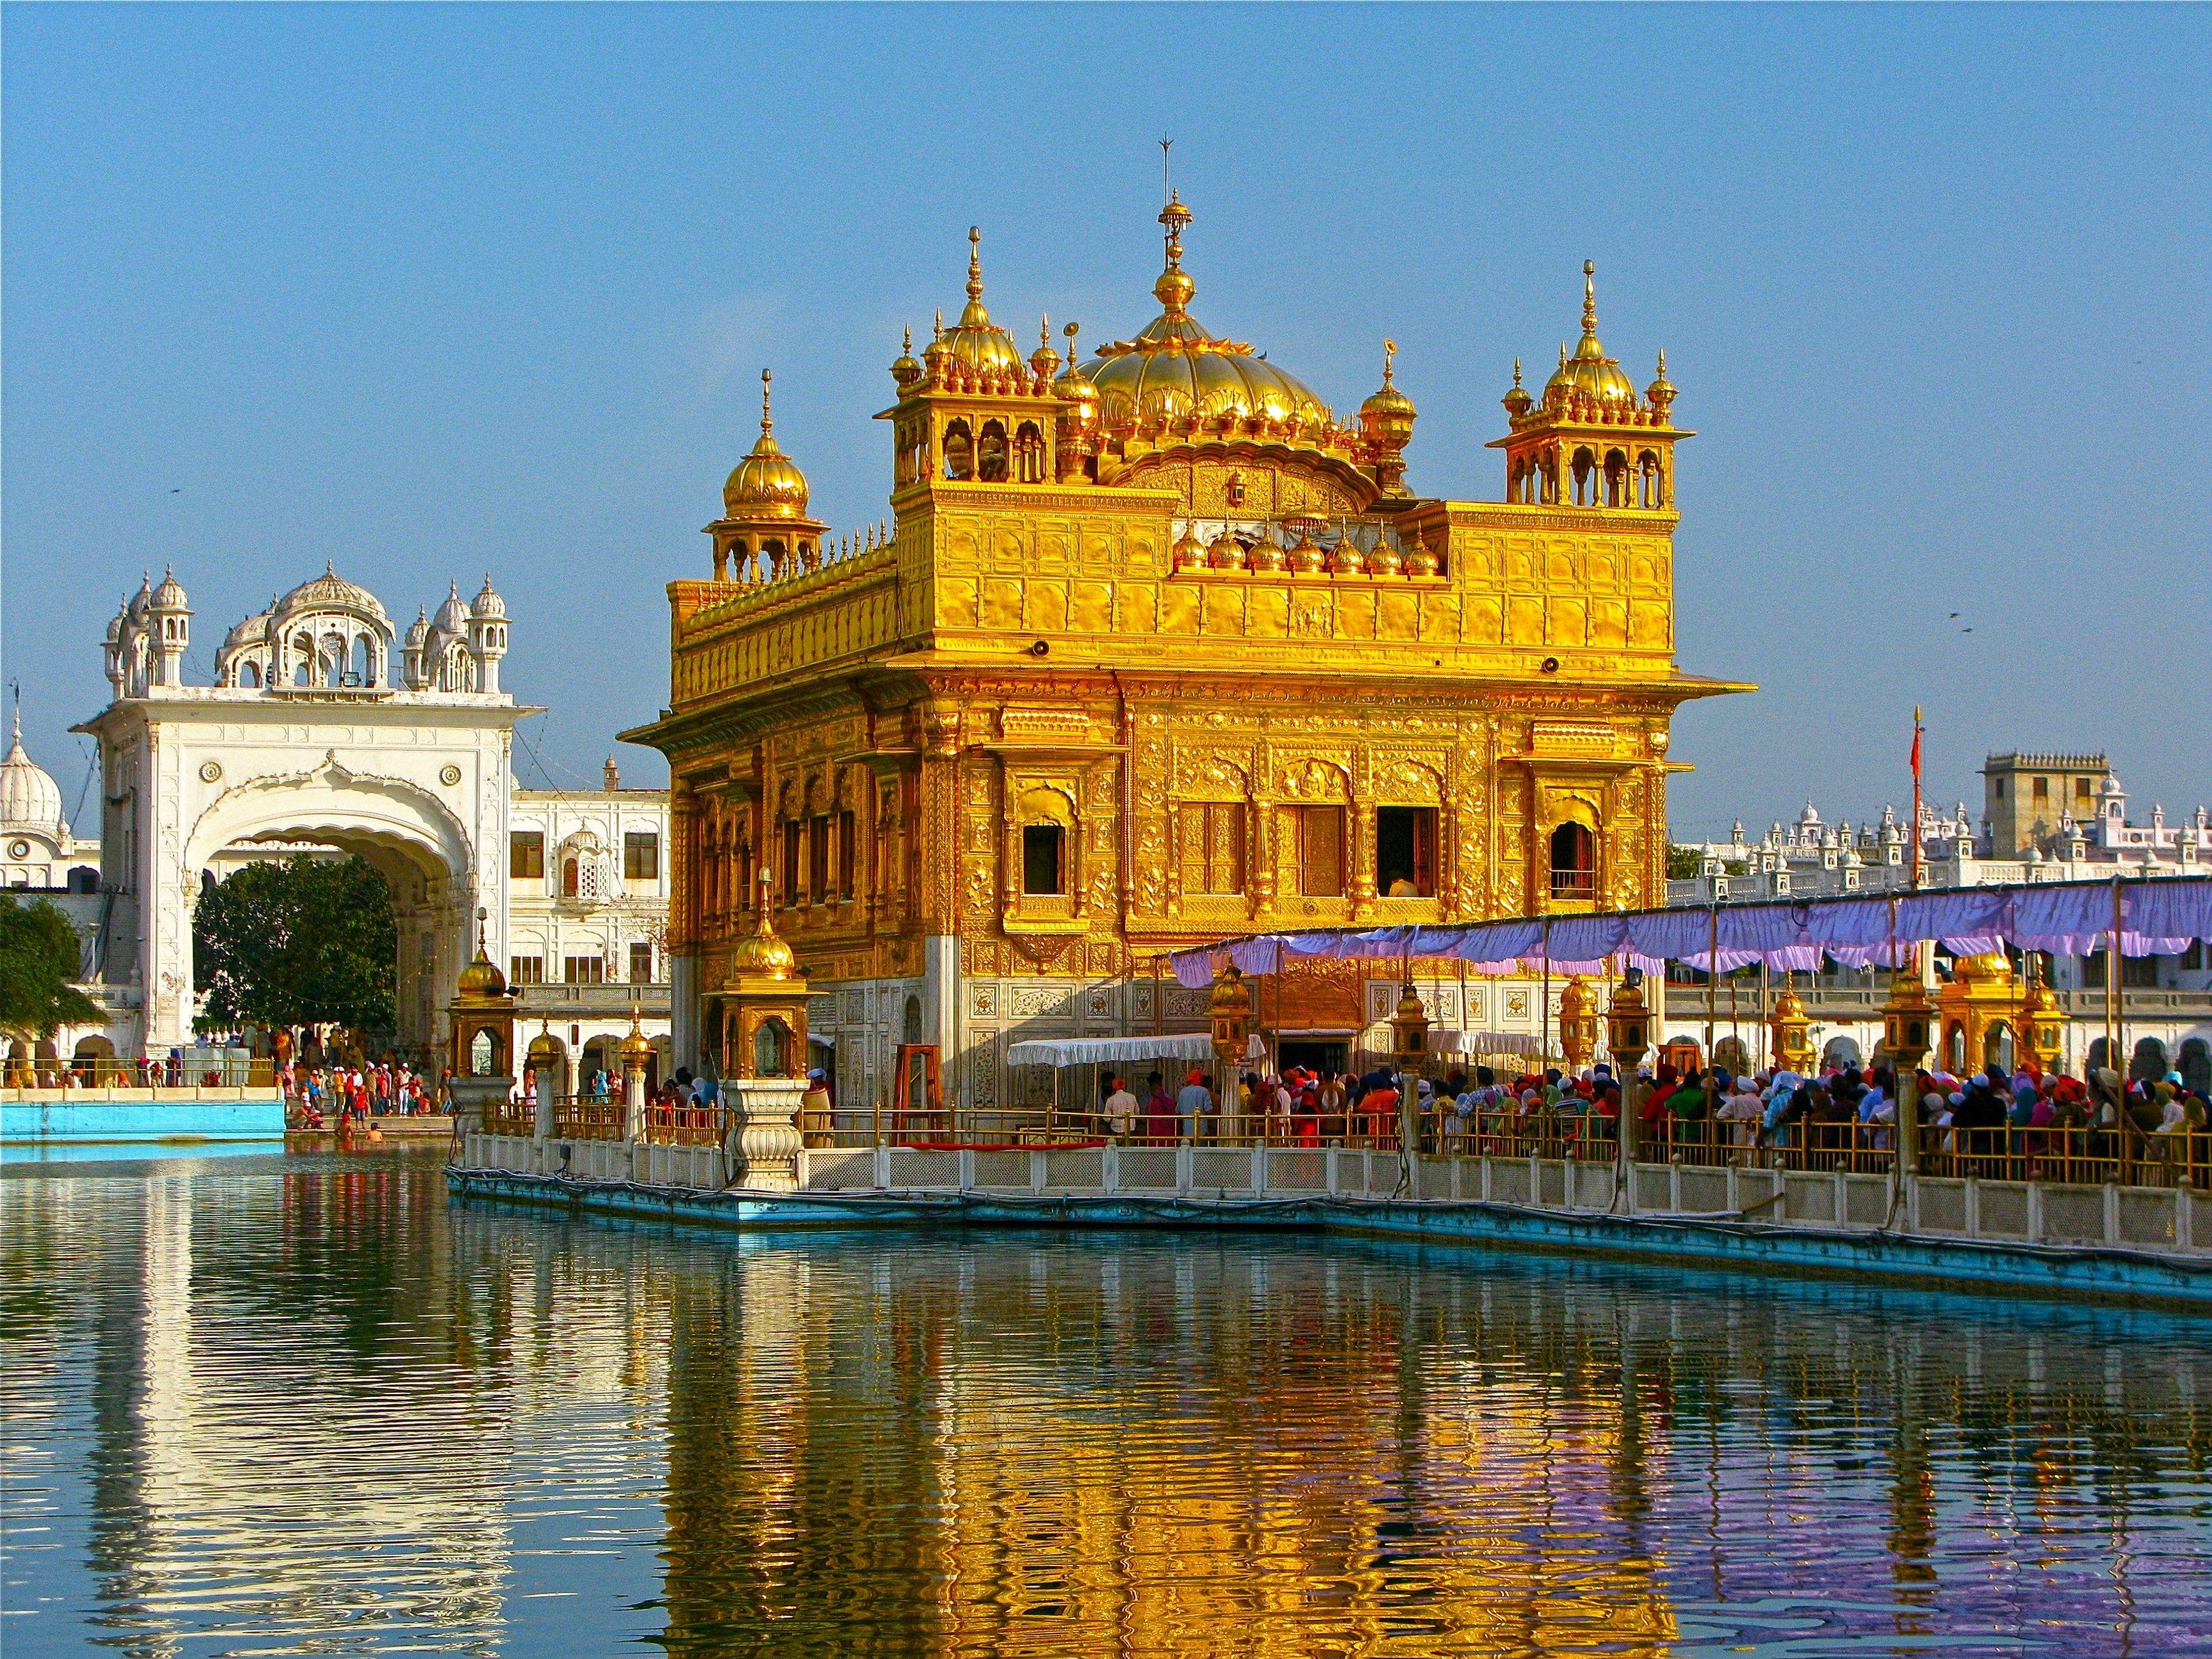 Harmandir Sahib 4k Wallpaper Hdwallpaper Desktop Golden Temple Golden Temple Amritsar Amritsar